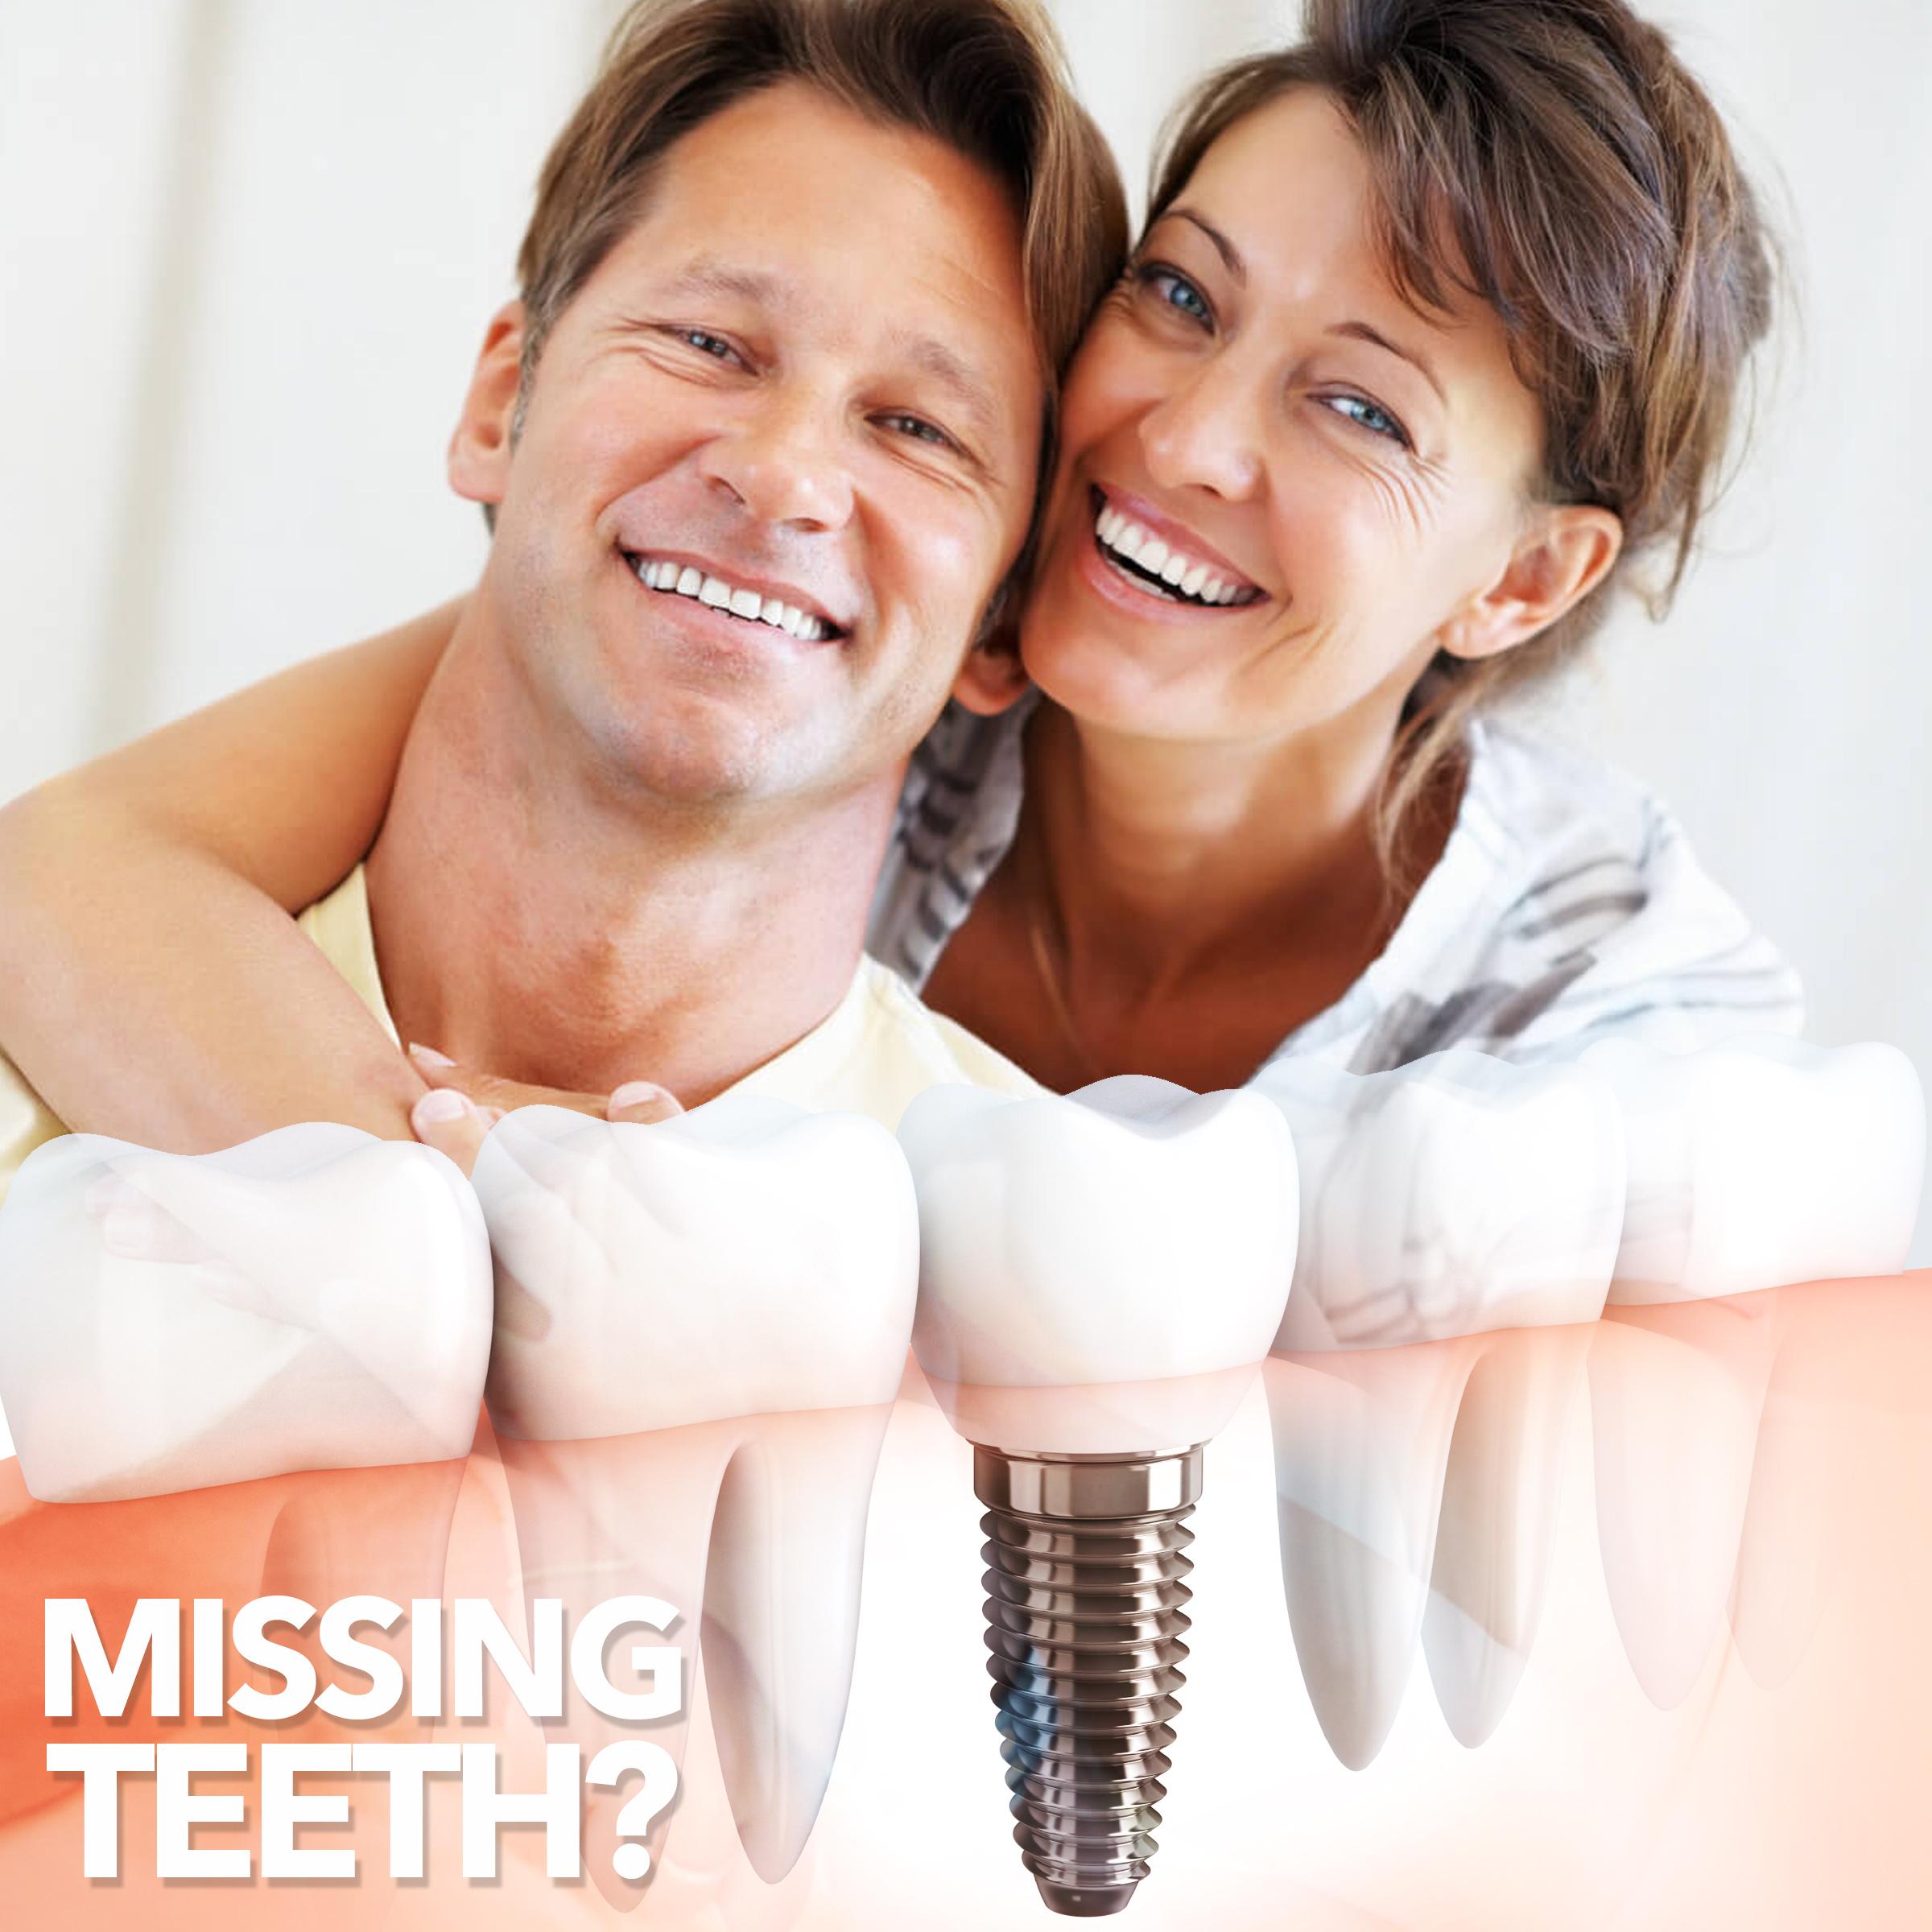 Dental Implants in Blytheville, AR